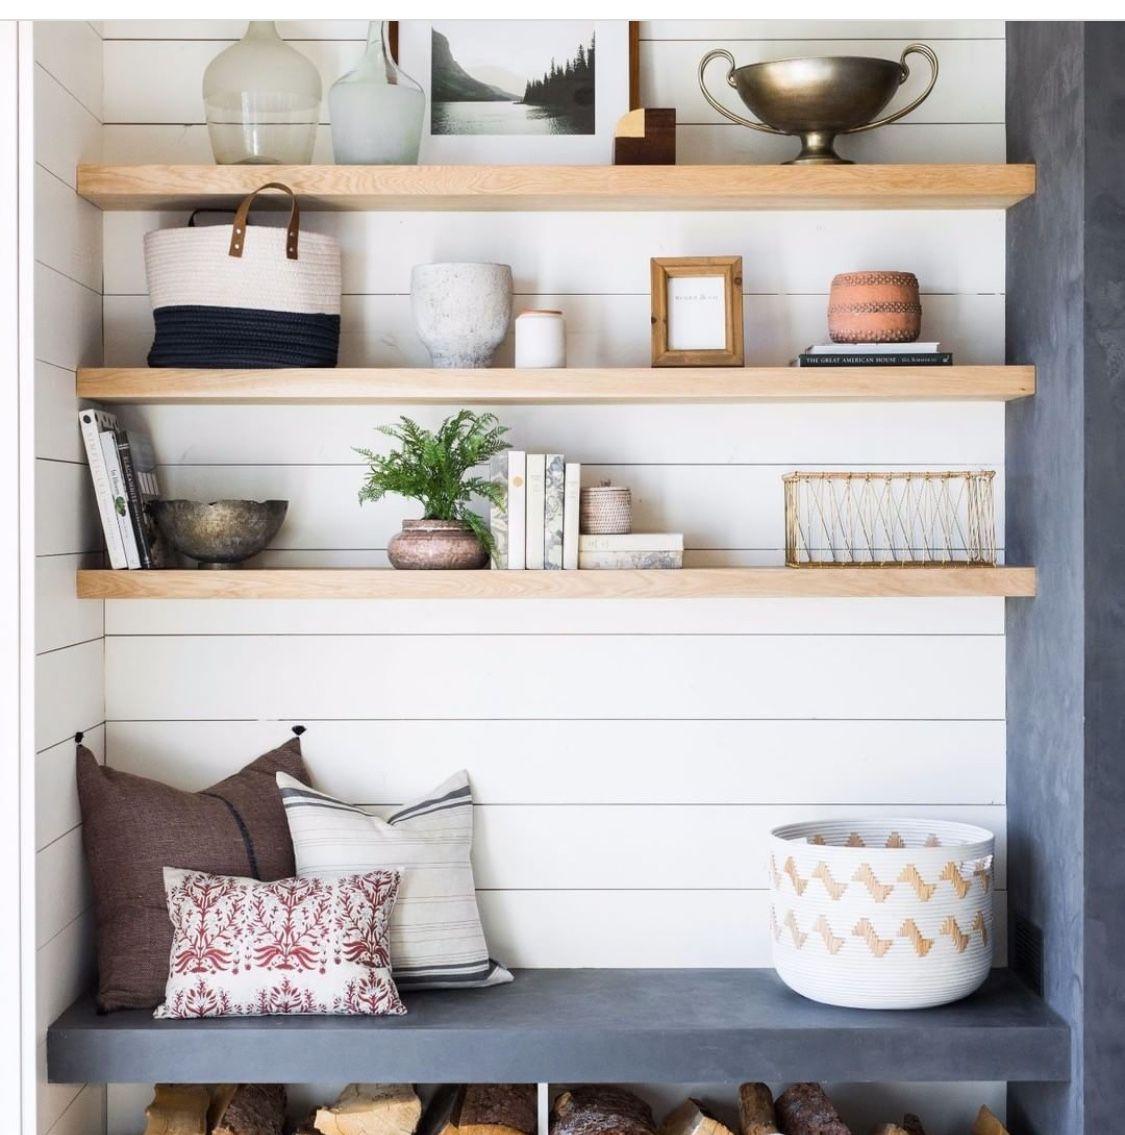 Shelves and concrete | Shelves, Wood storage, Living room ...